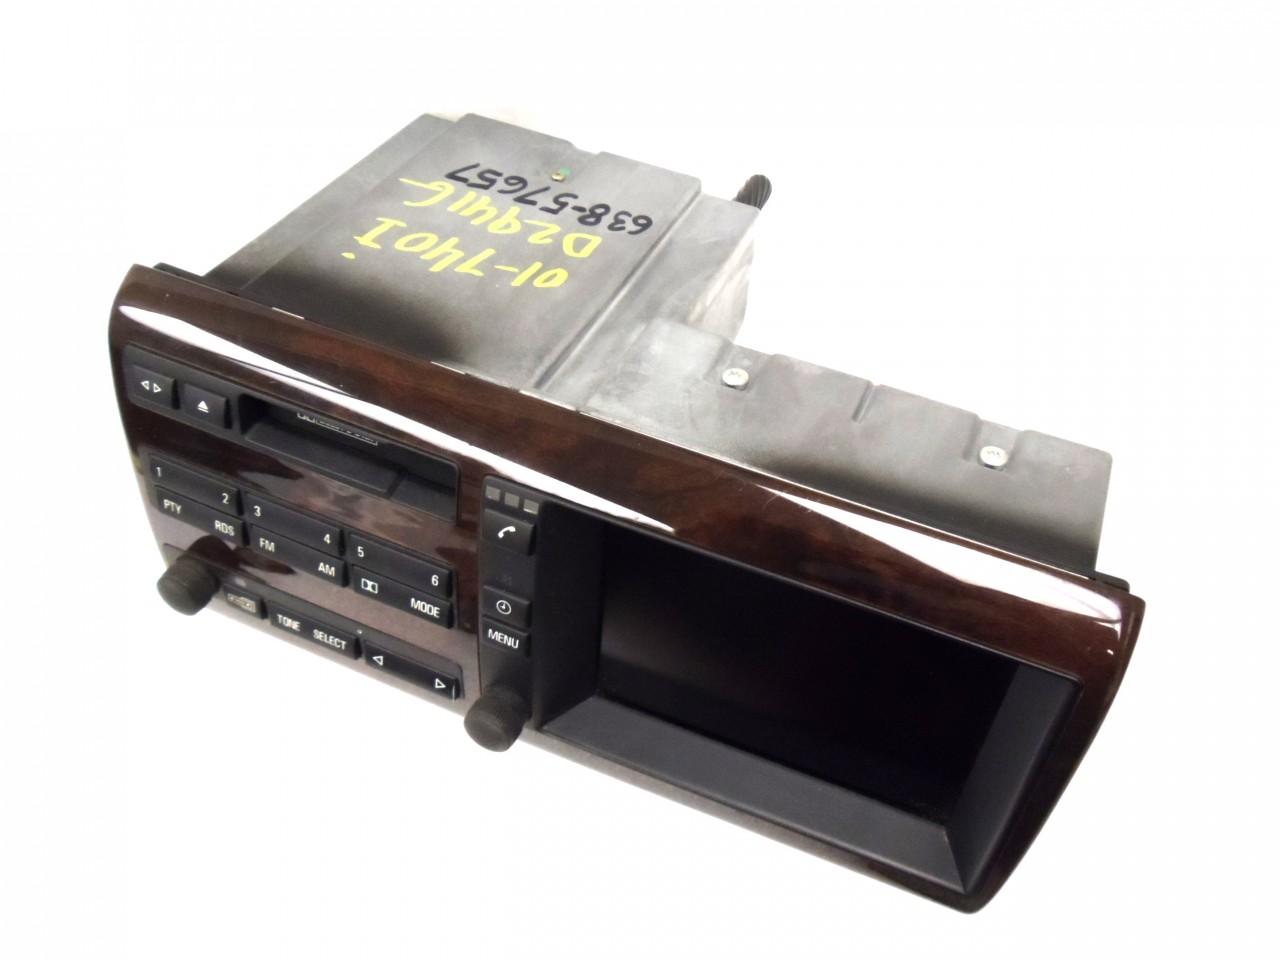 BMW Navigation GPS Radio Tape Player 740 750 525 530 540 M5 528i Series 95 2001